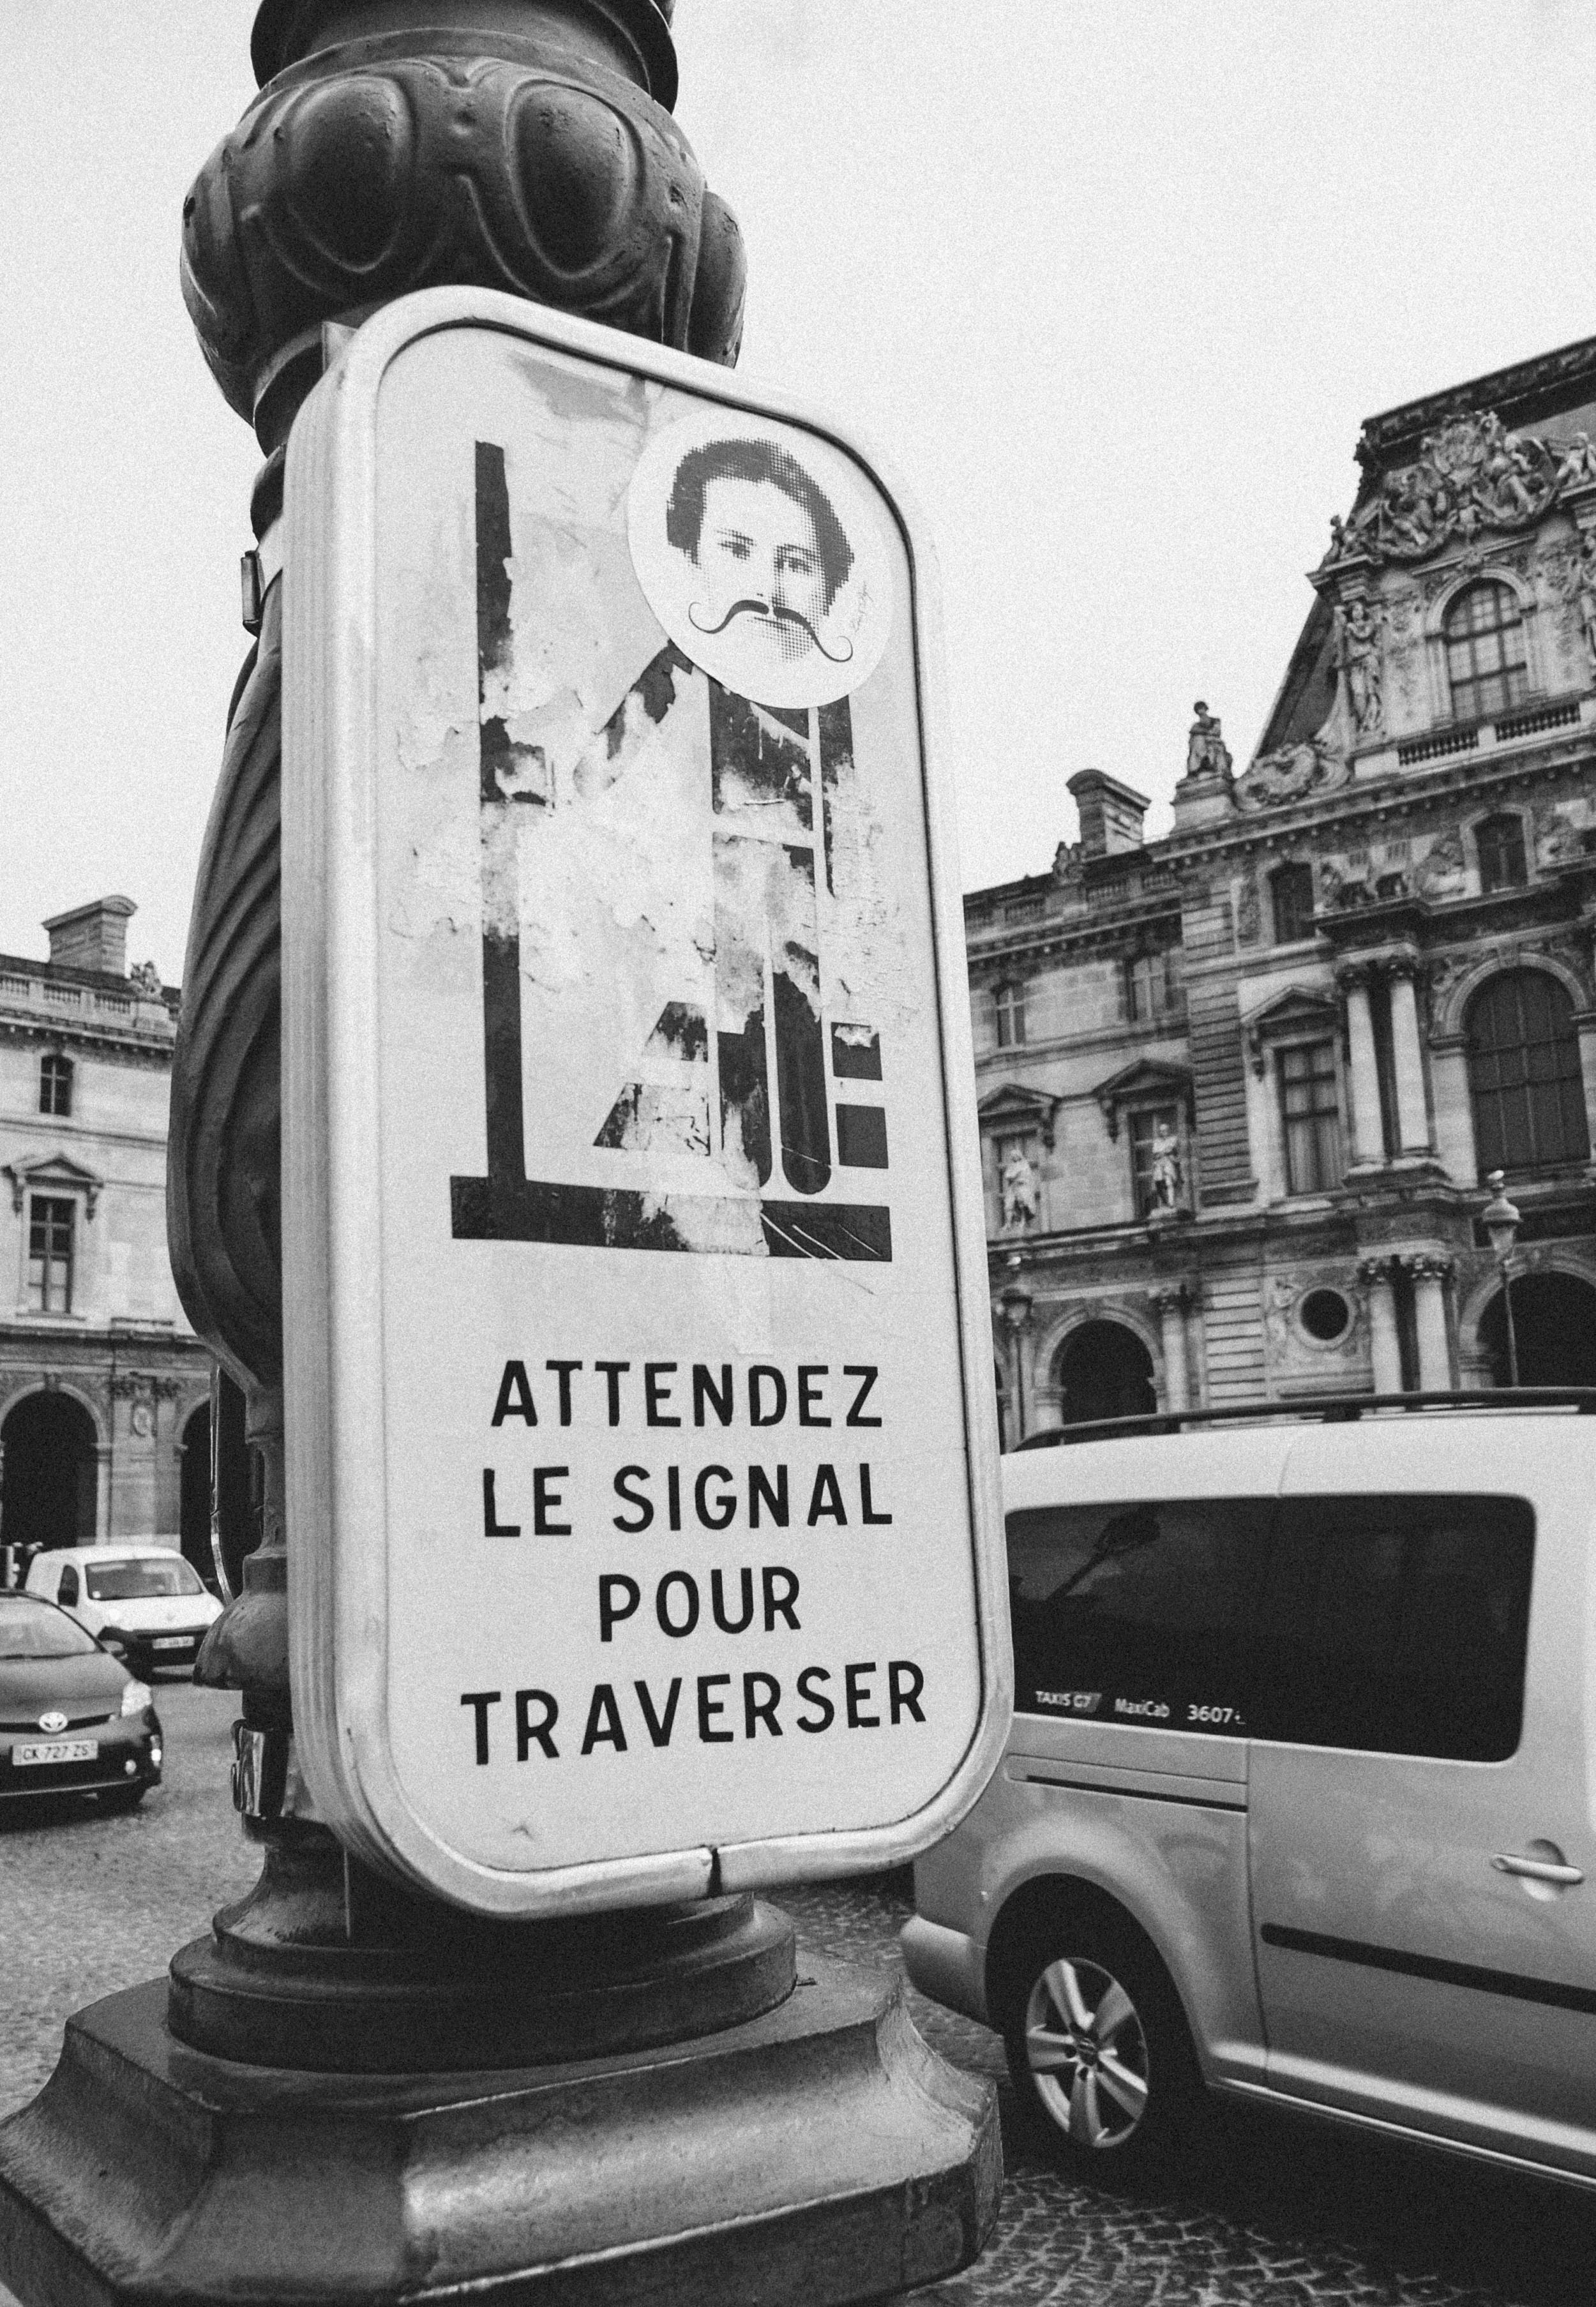 Details from Paris